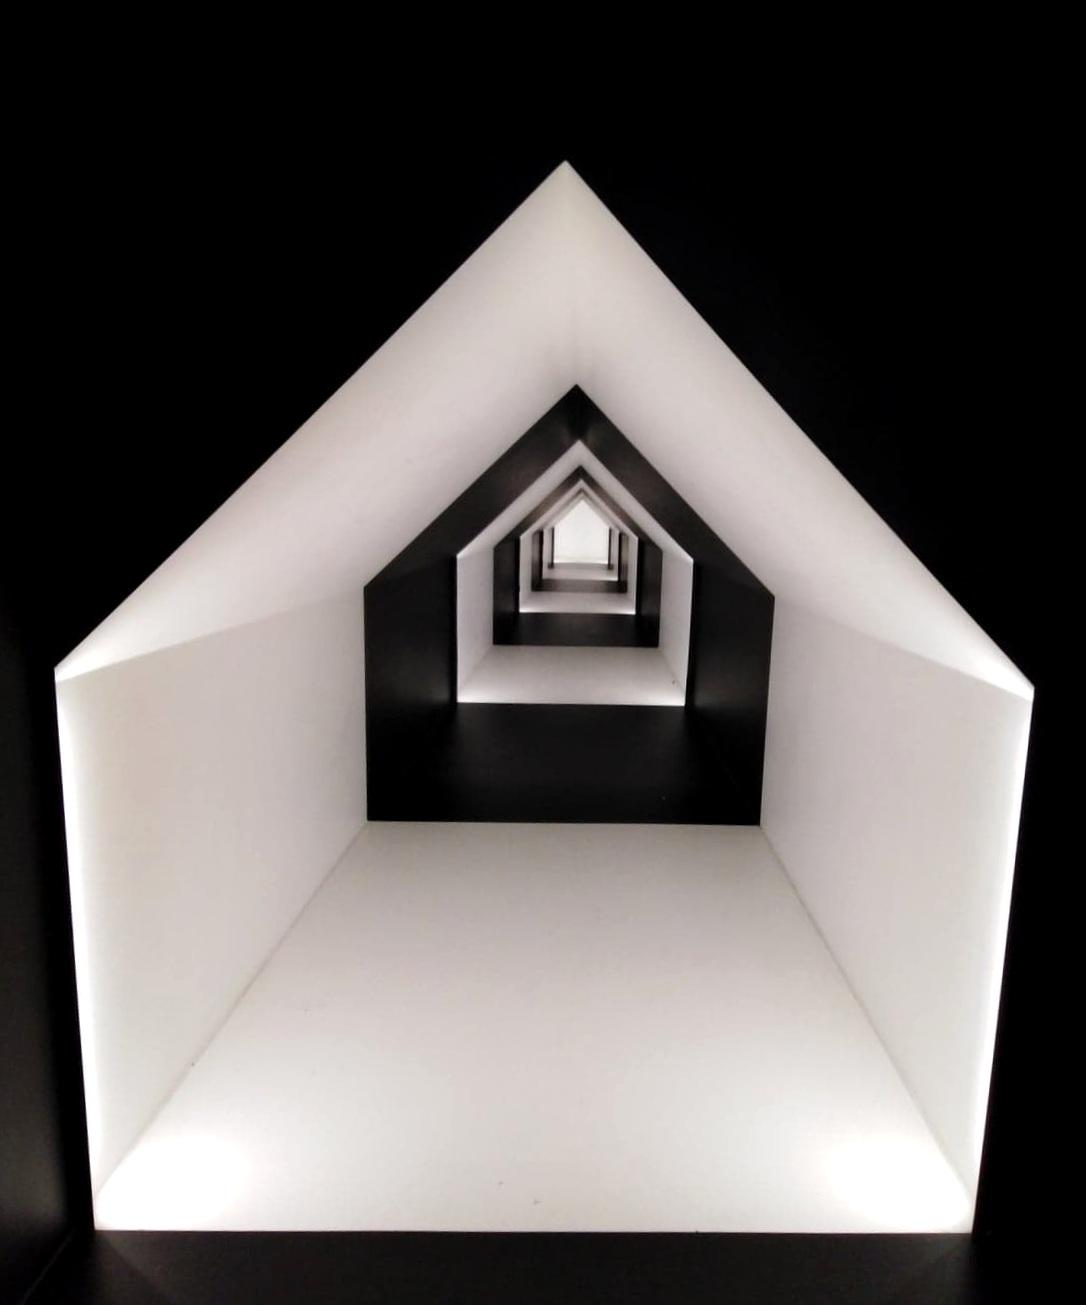 Escher x nendo   Between Two Worlds at NGV